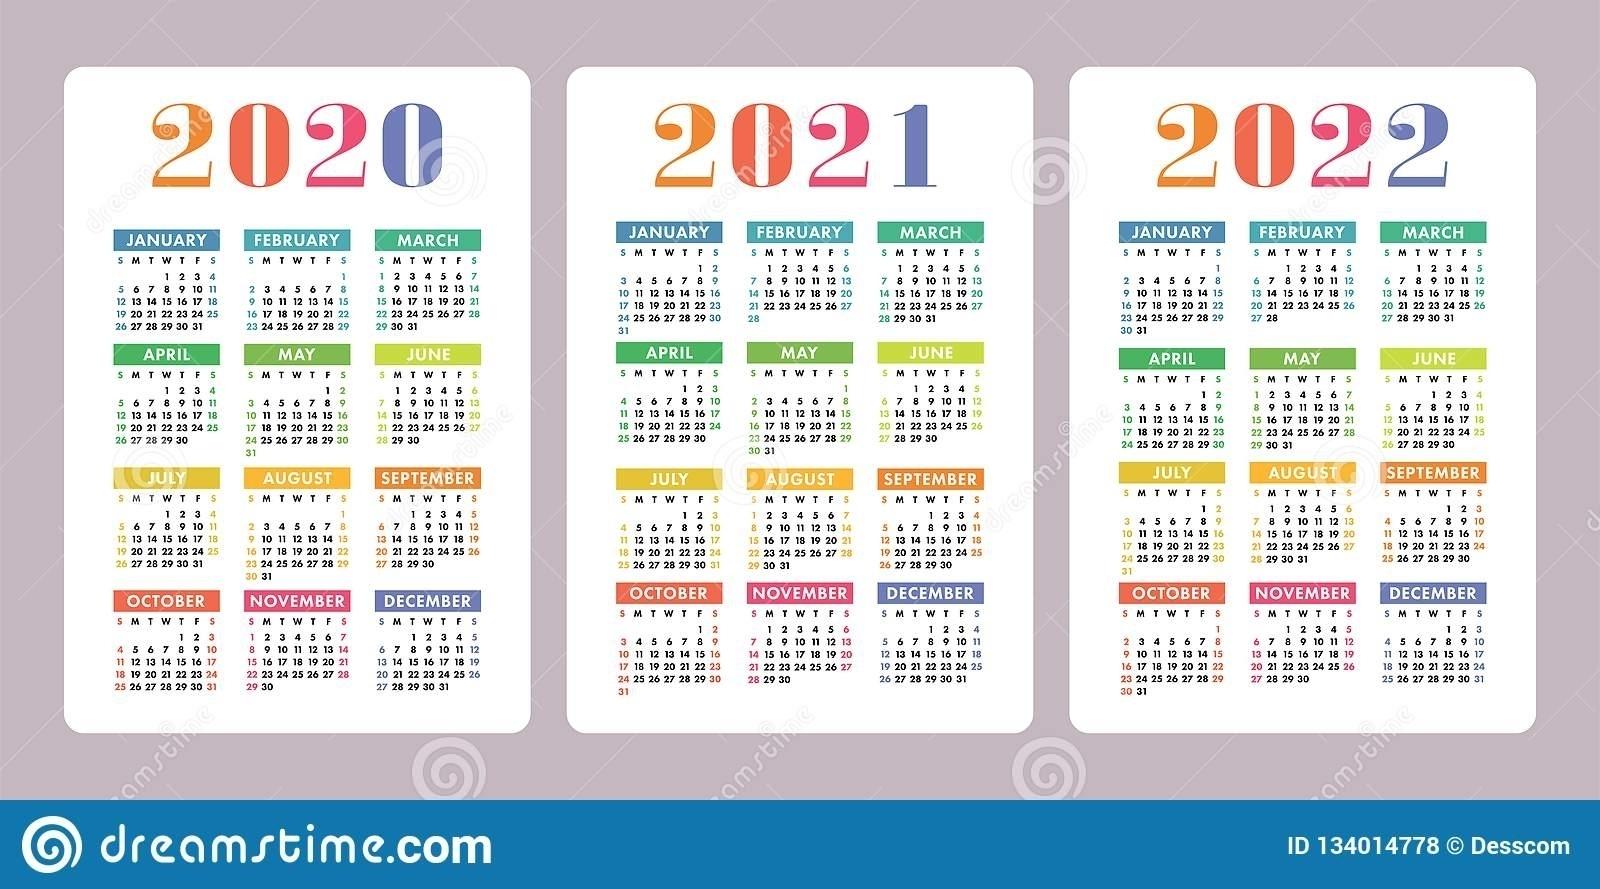 Collect Calendars 2021 2022 2023 Free Printable